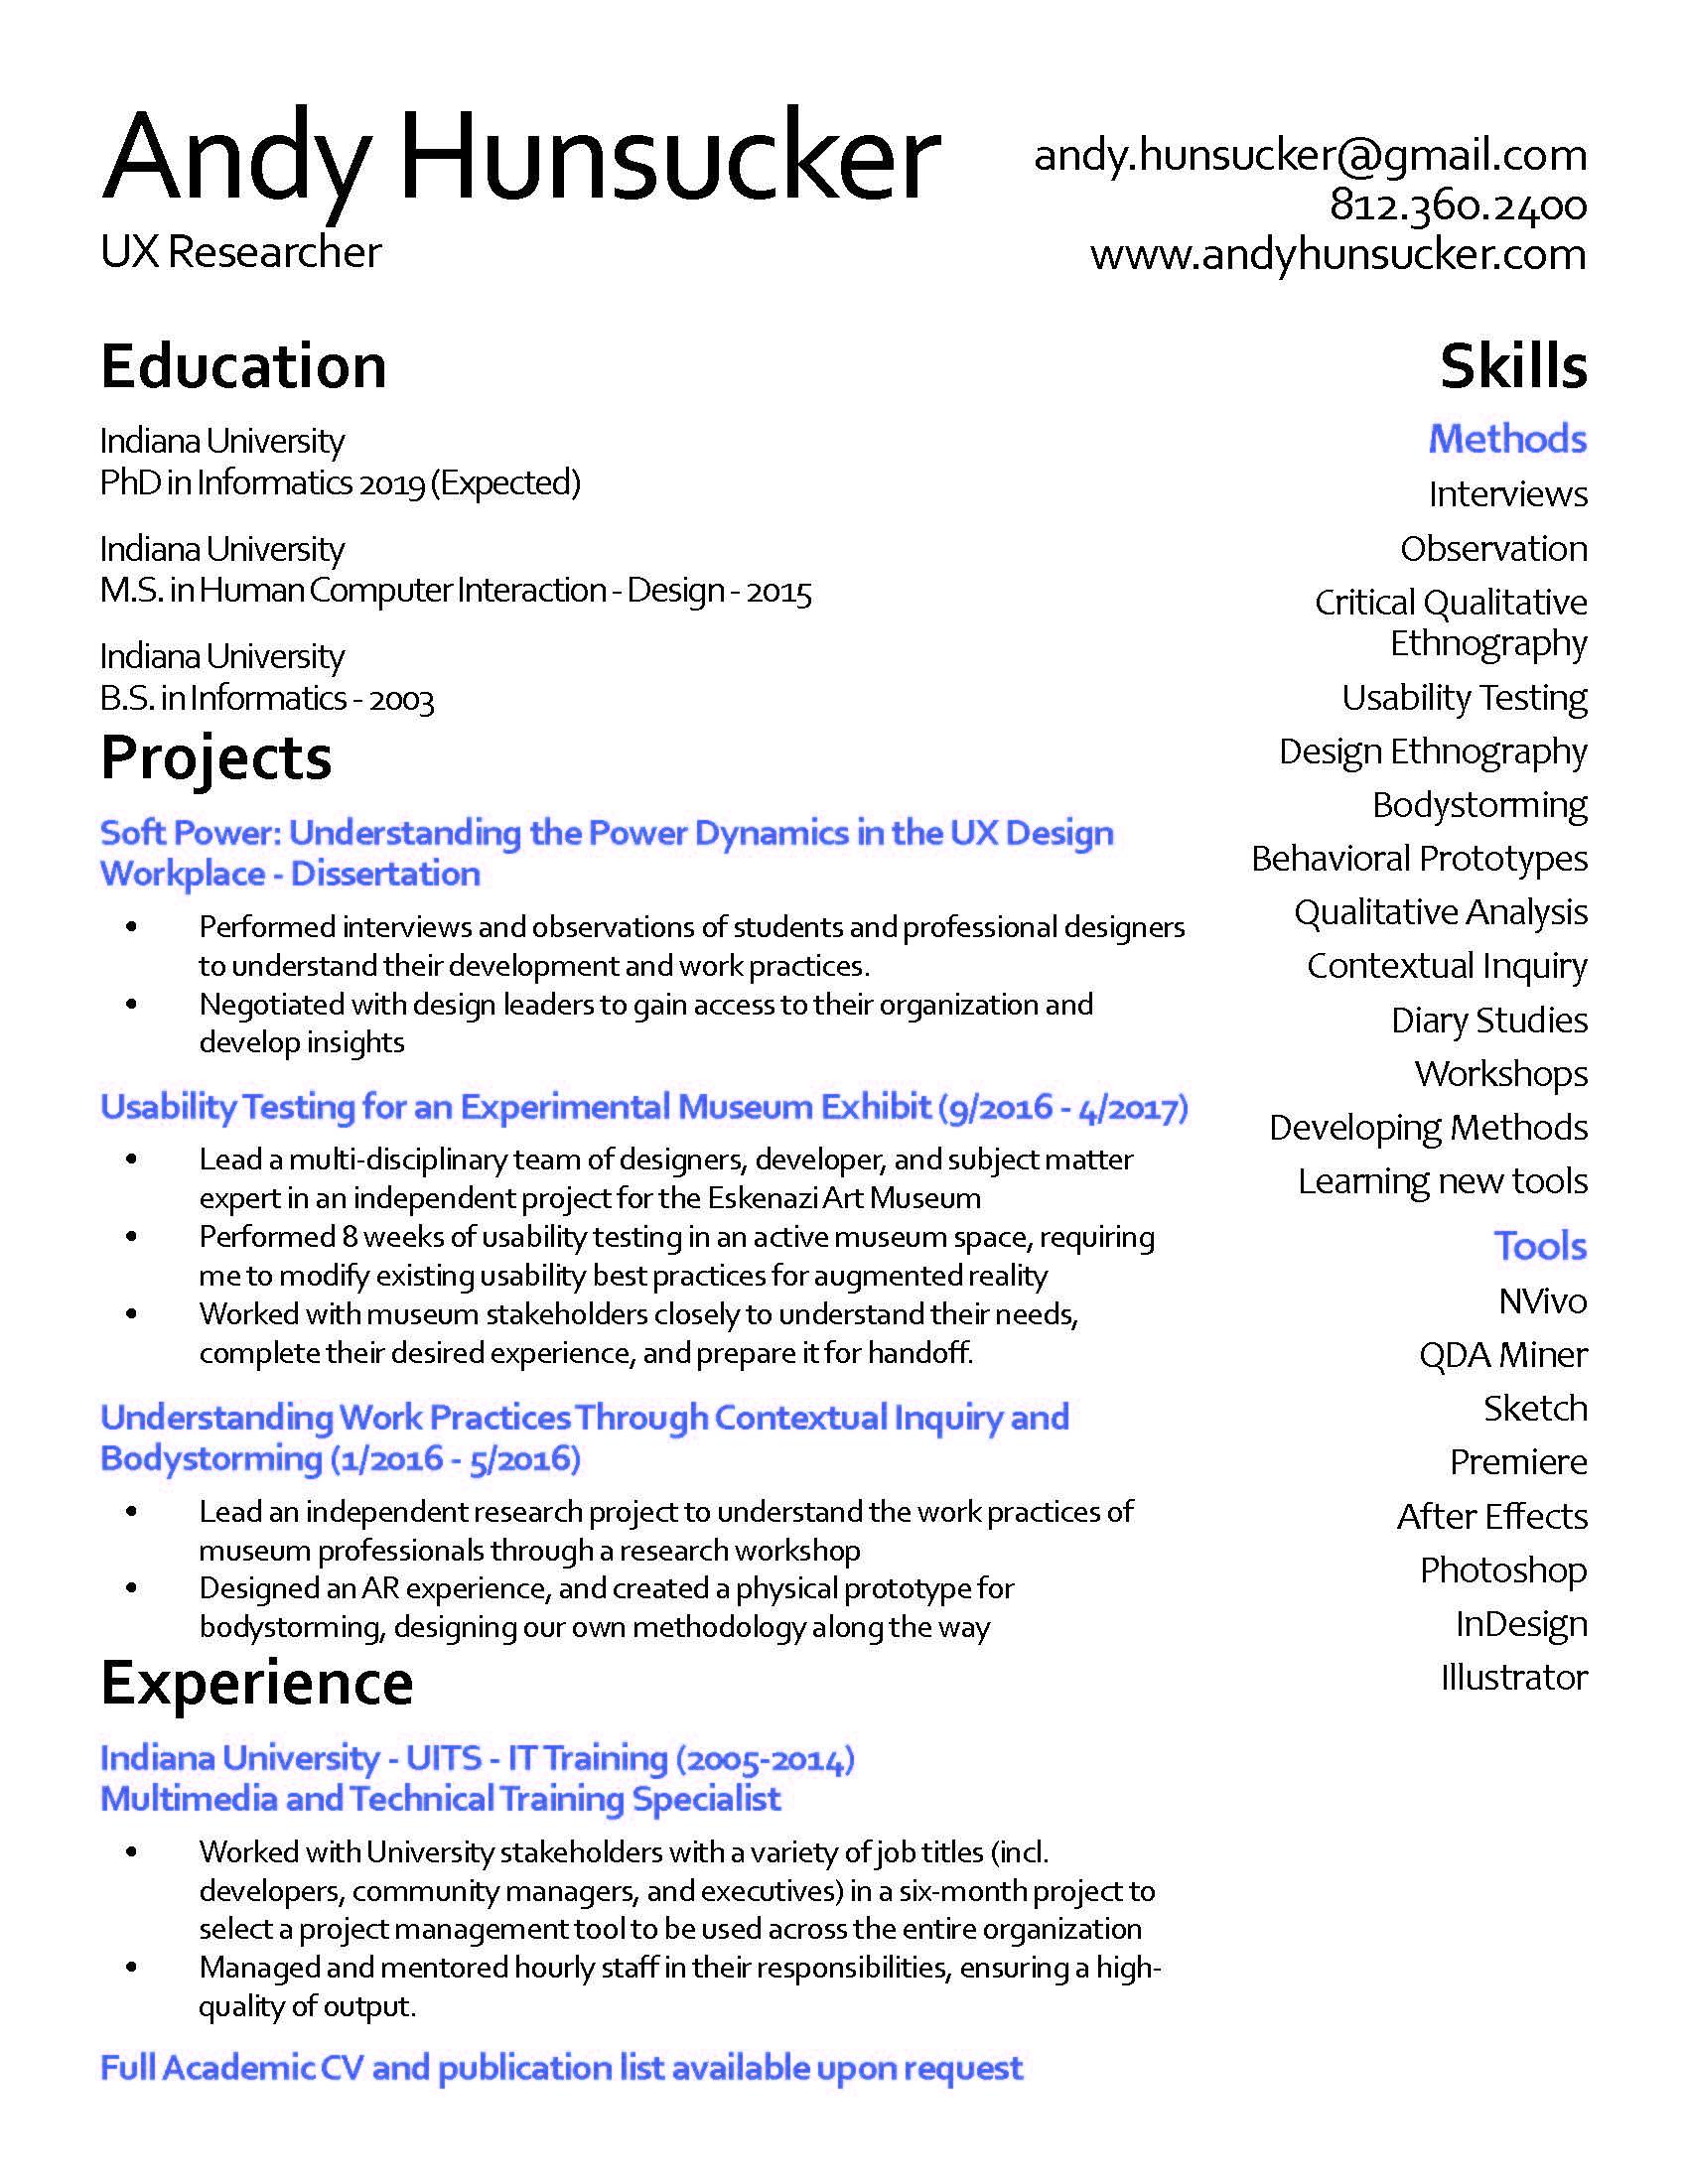 Andy Hunsucker Resume Spring 2019_Page_1.jpg